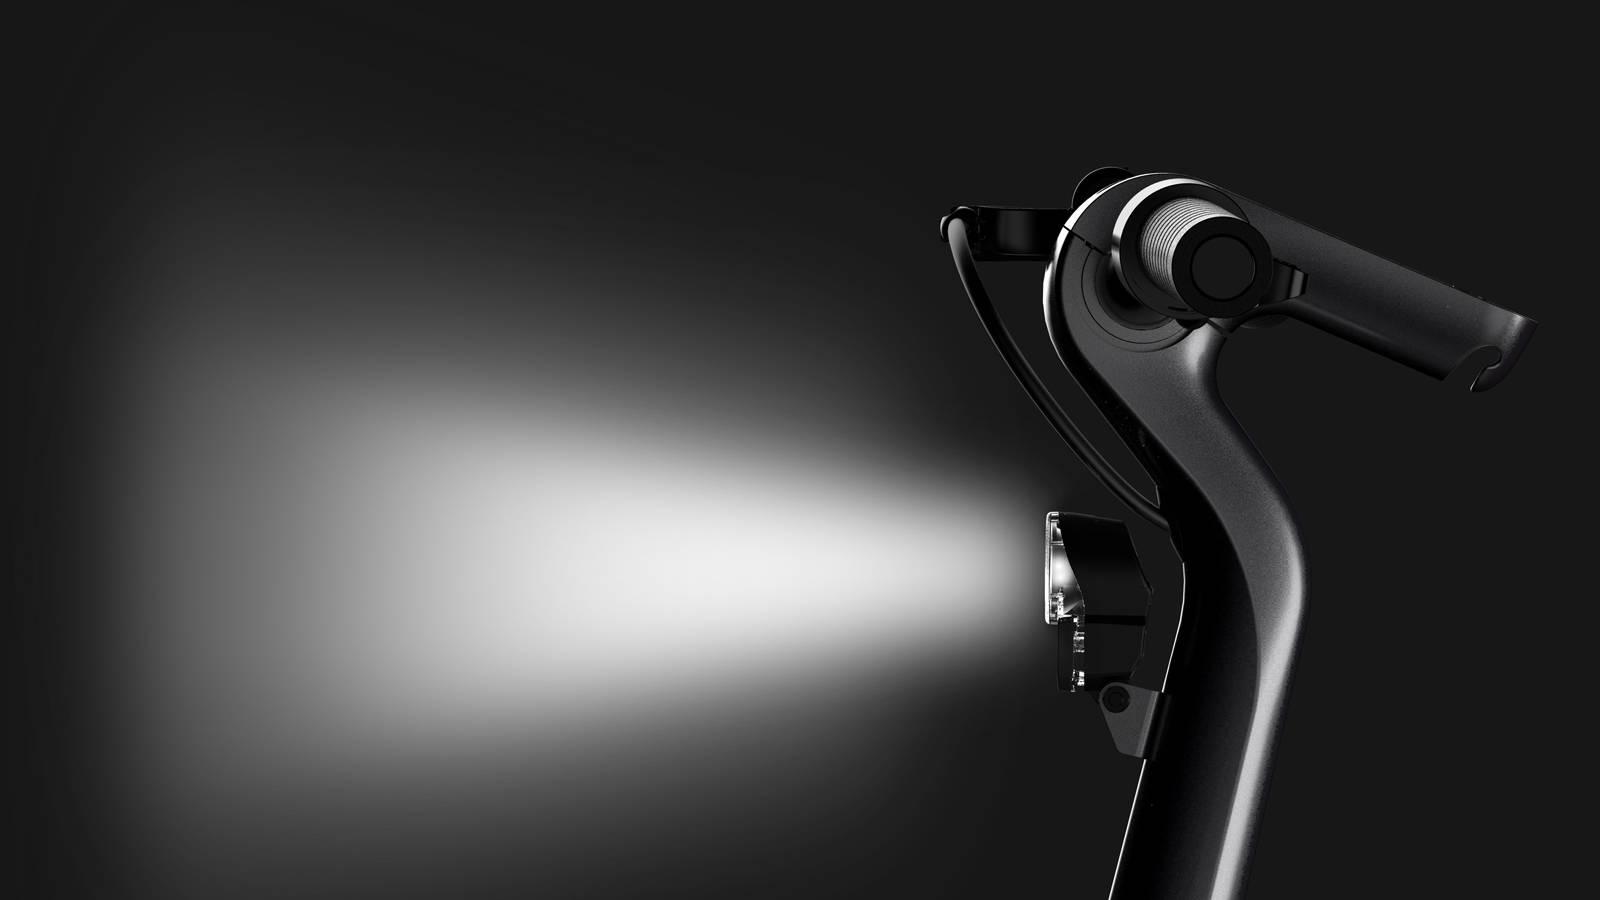 Okai ES500 Bike Light bright handlebars screen